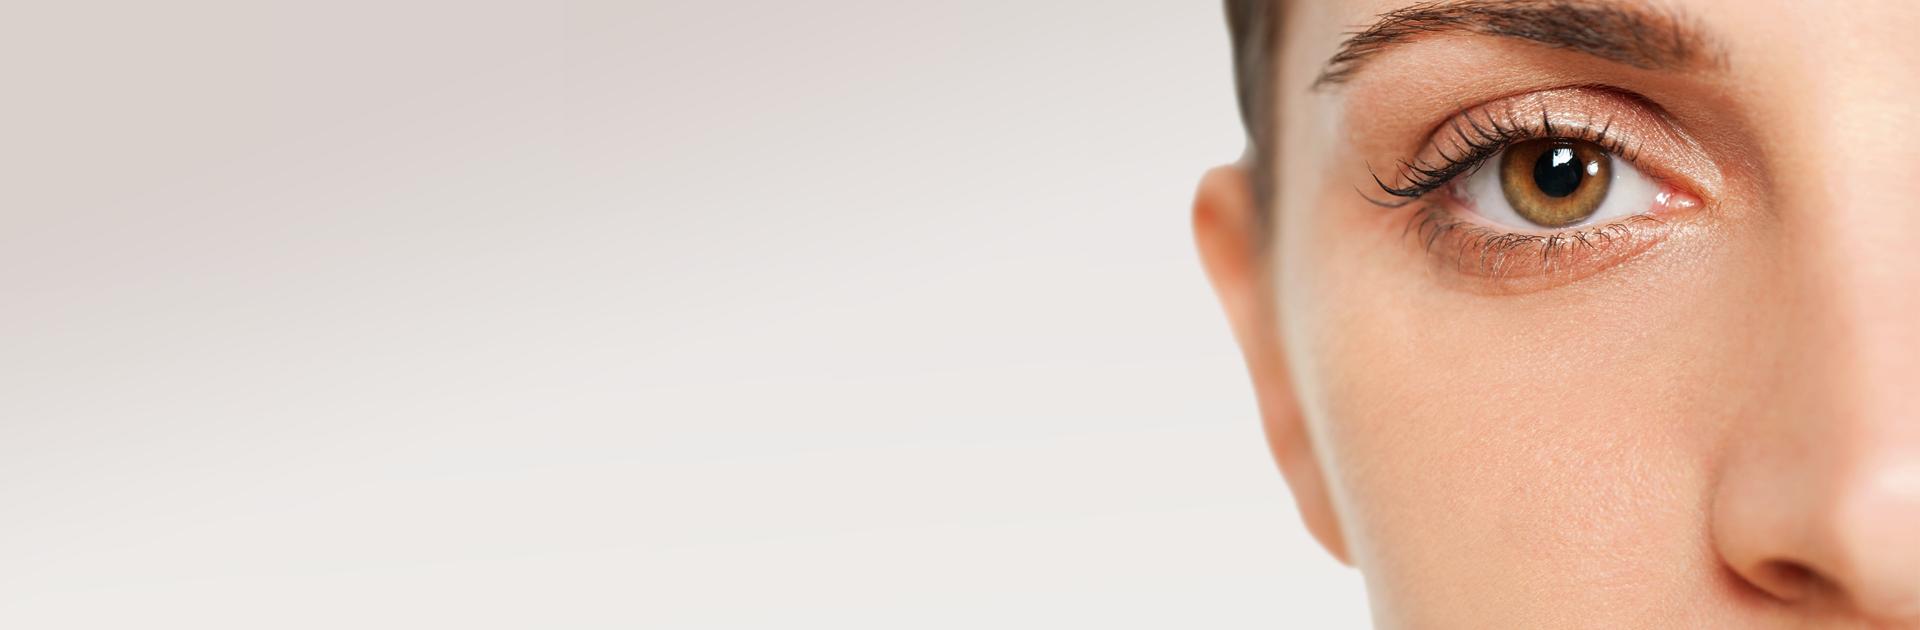 Hautverjüngung mit eigenem Blutplasma | Asklepion